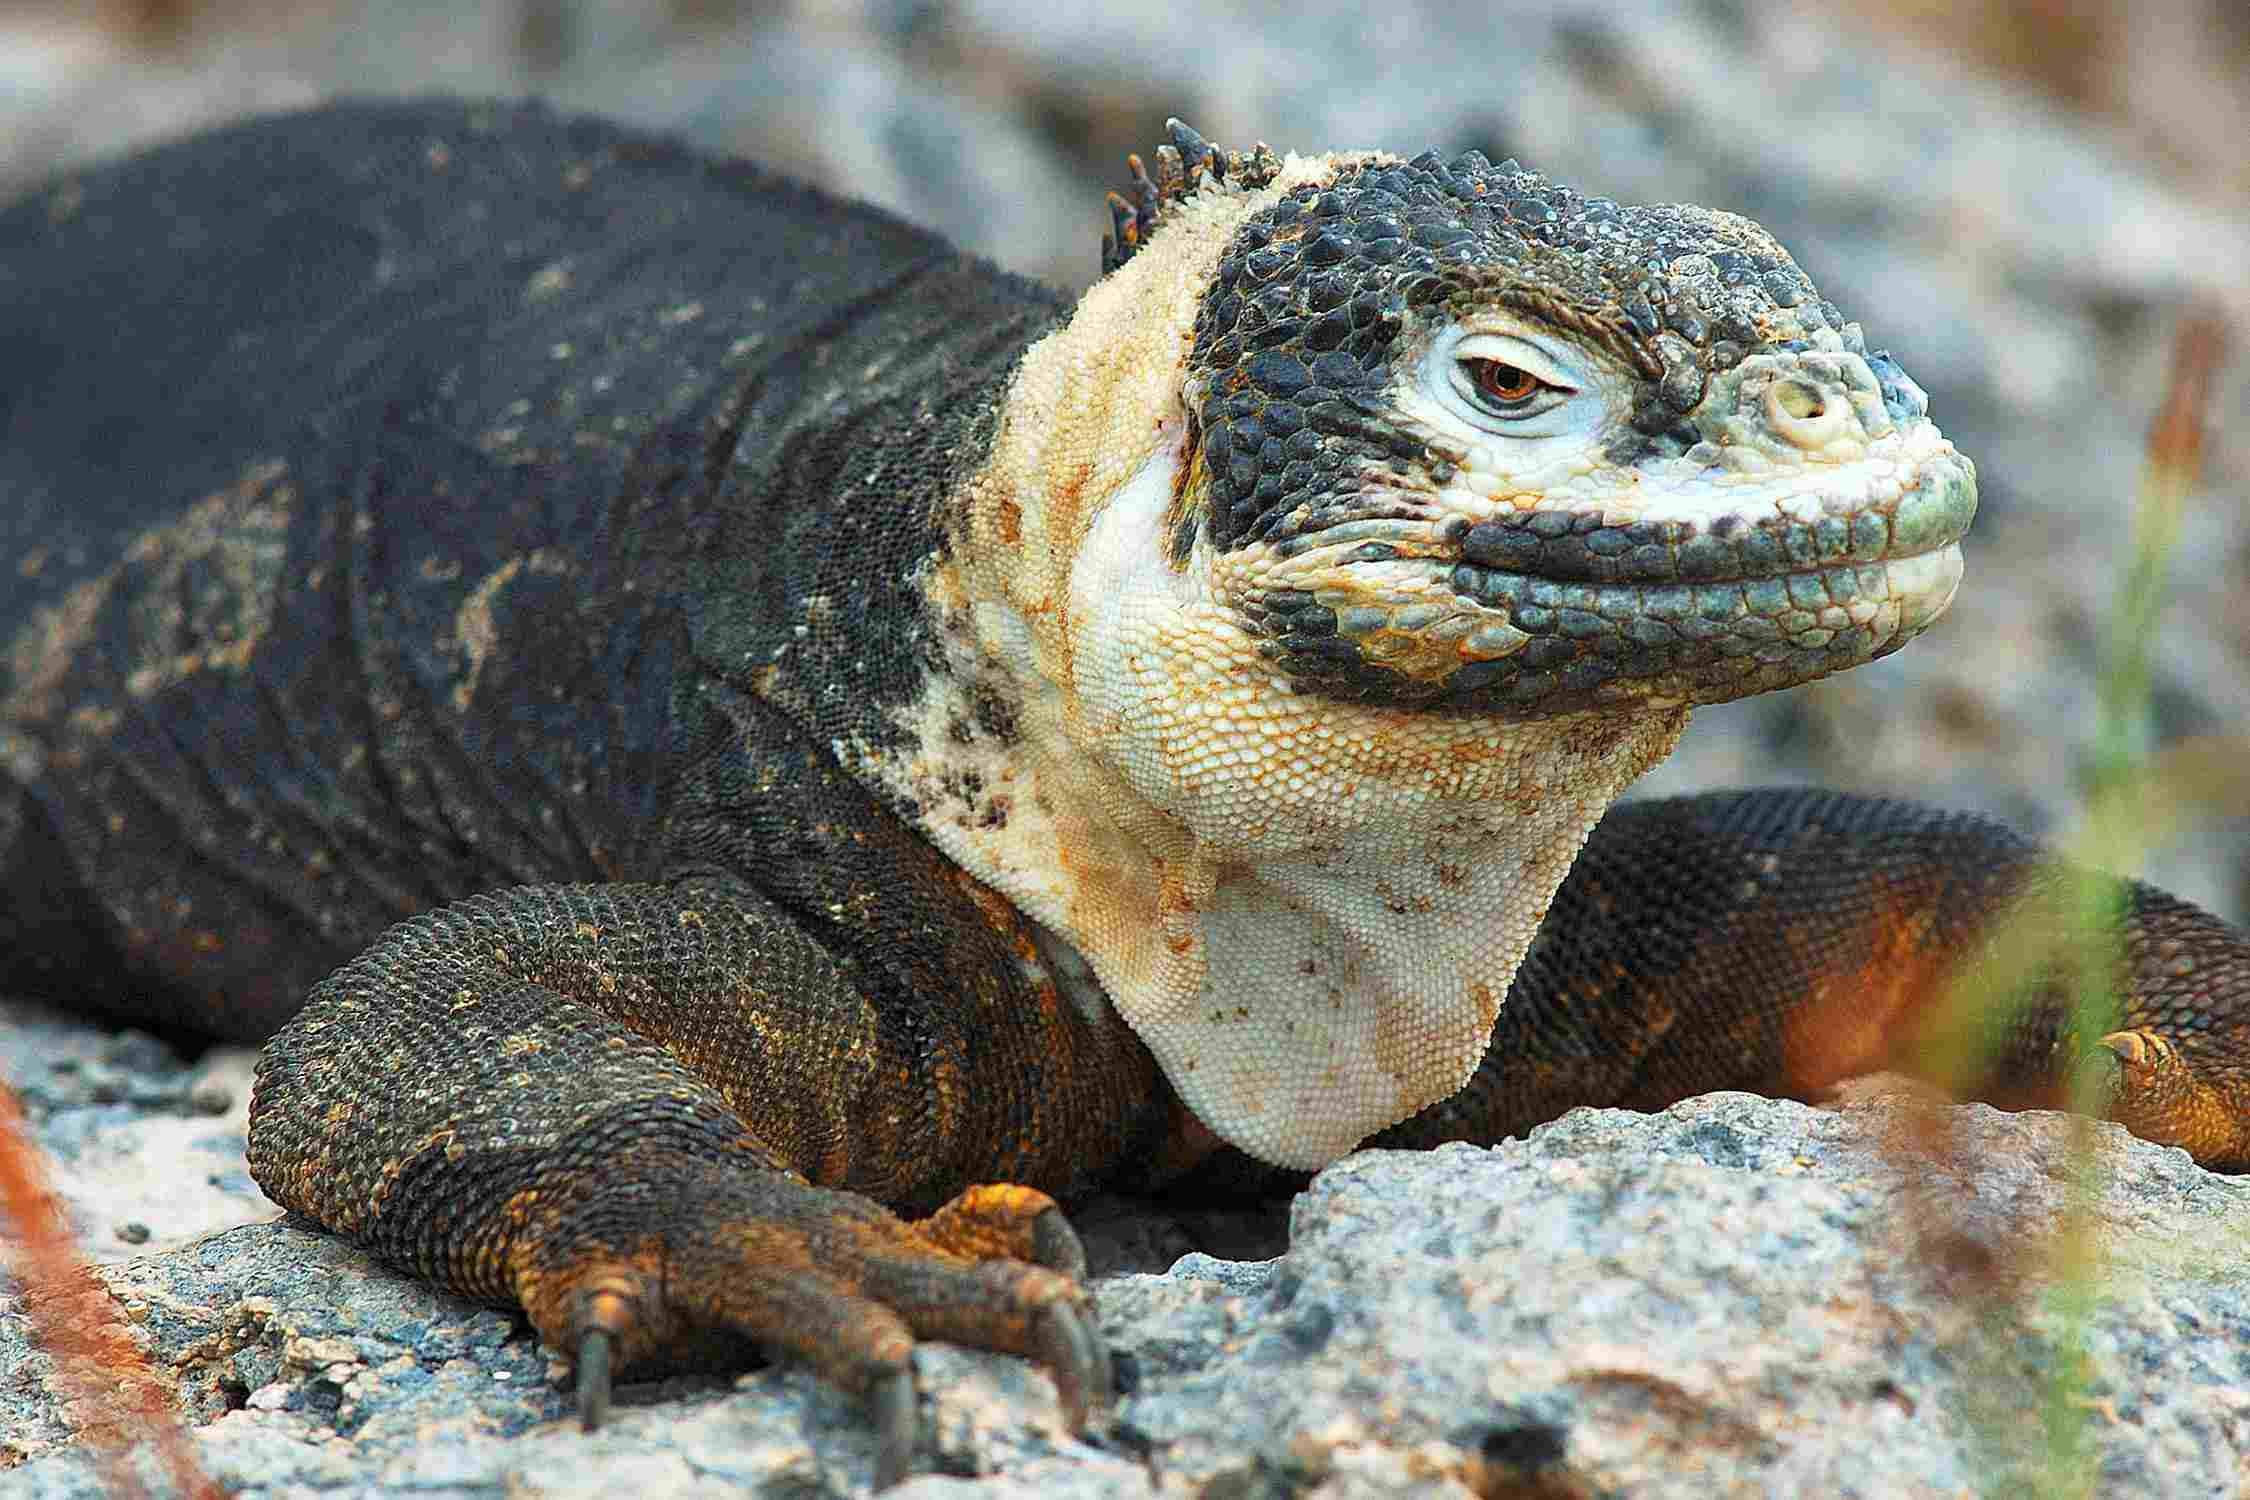 Galapagos land iguana - Conolophus subcristatus